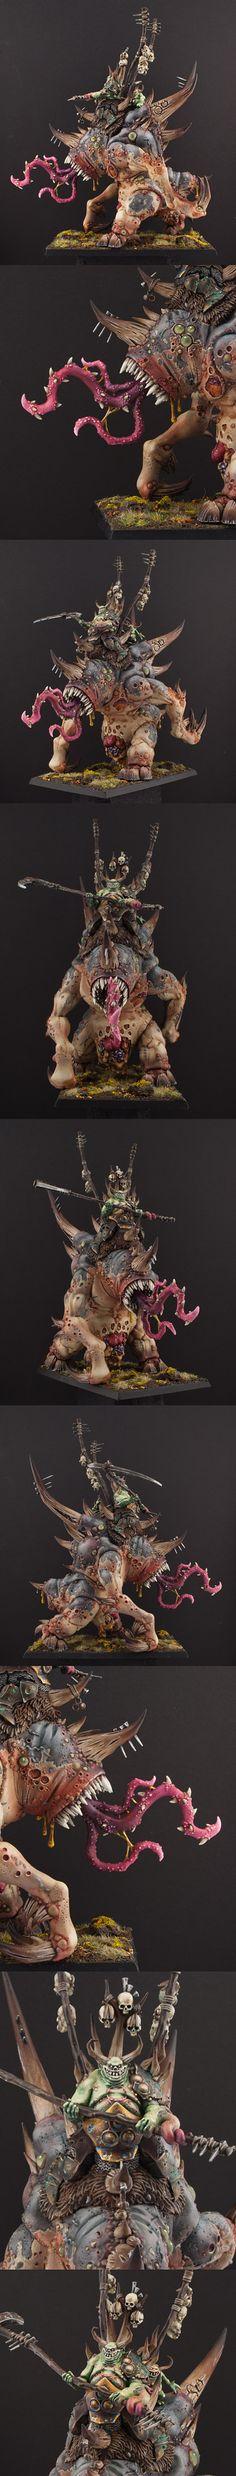 Maggoth Lord: Morbidex Twiceborn